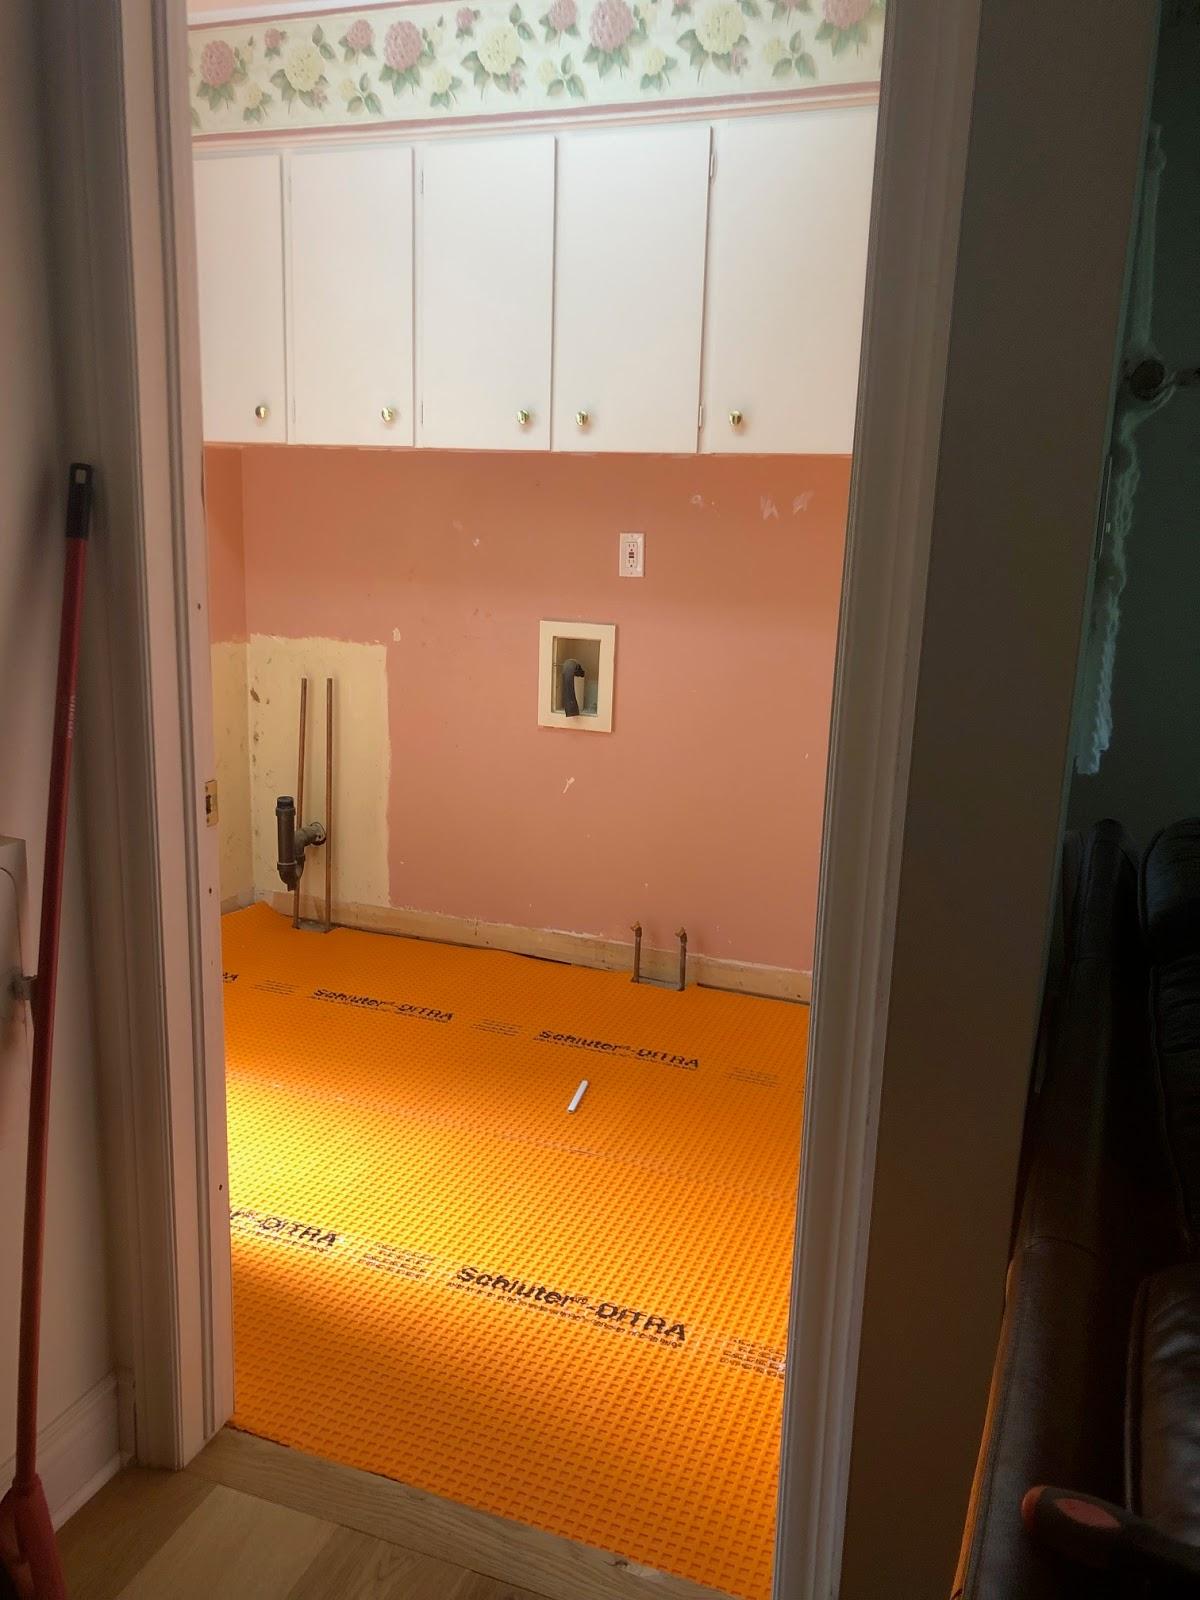 One Room Challenge: Week 2 - Tile TIps